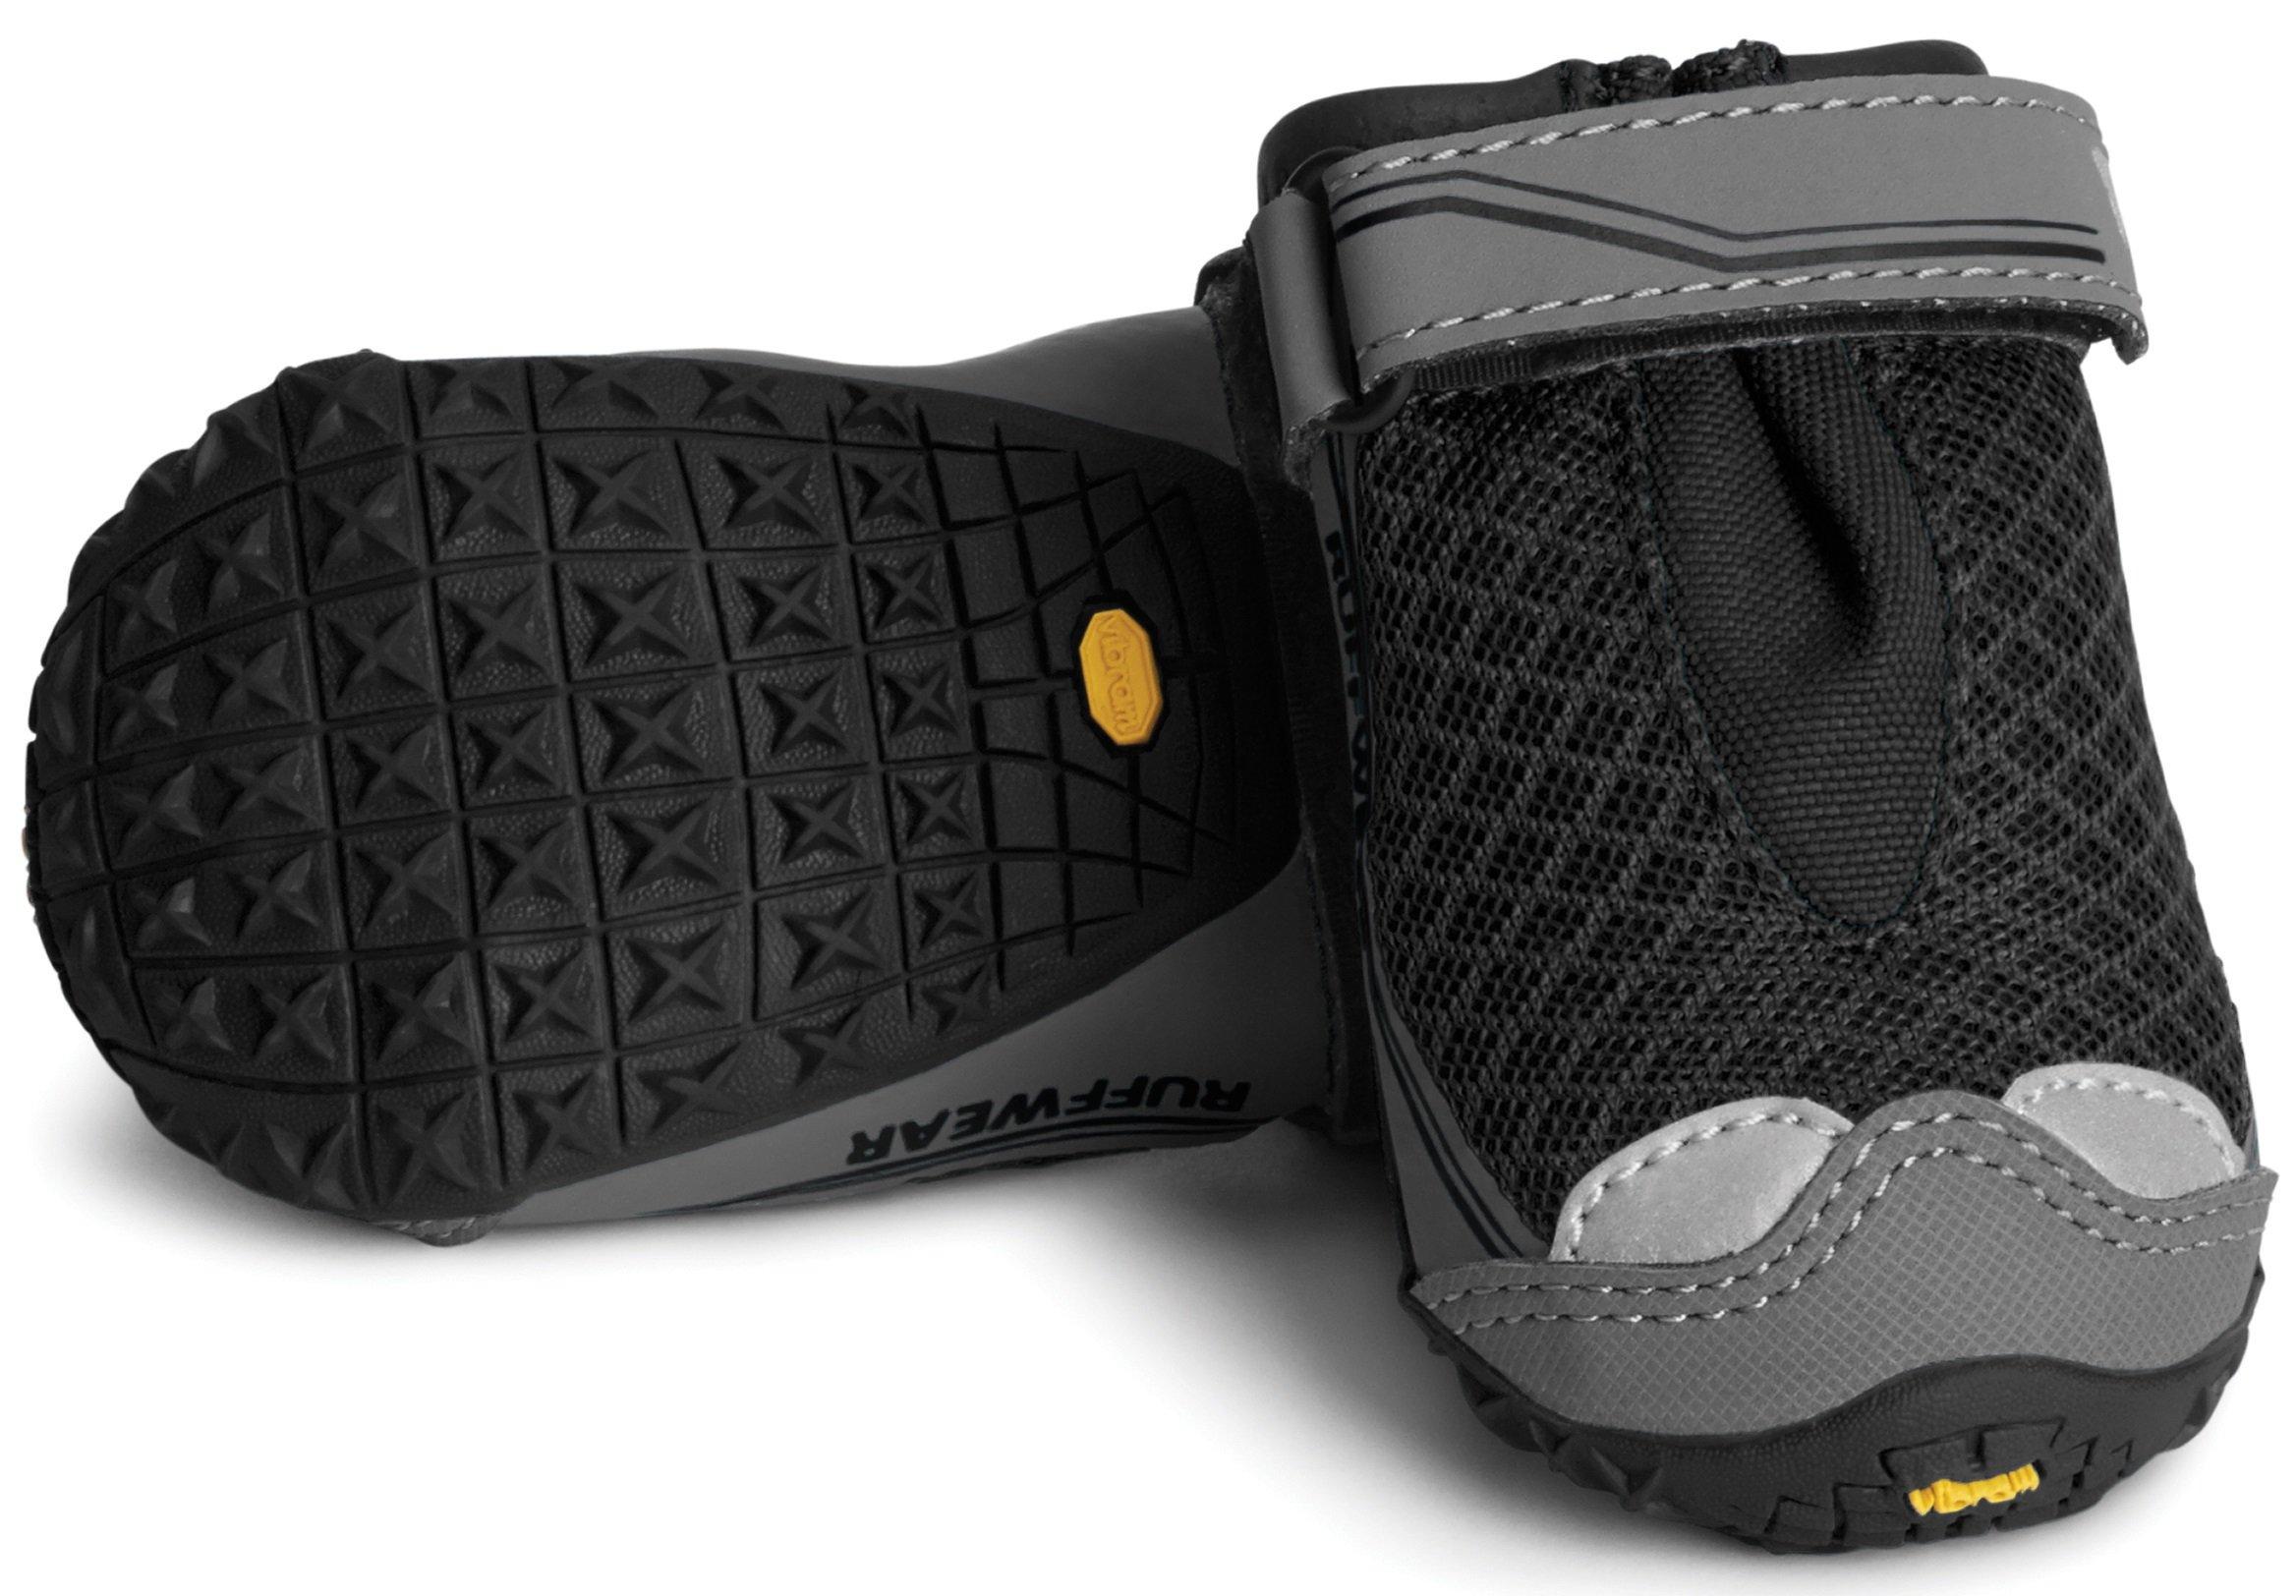 RUFFWEAR ♦ Grip TREX Dog Boots ♦ All Terrain Rugged PAW WEAR Set of Two Colors (2.75 Inch, Obsidian Black) by RUFFWEAR